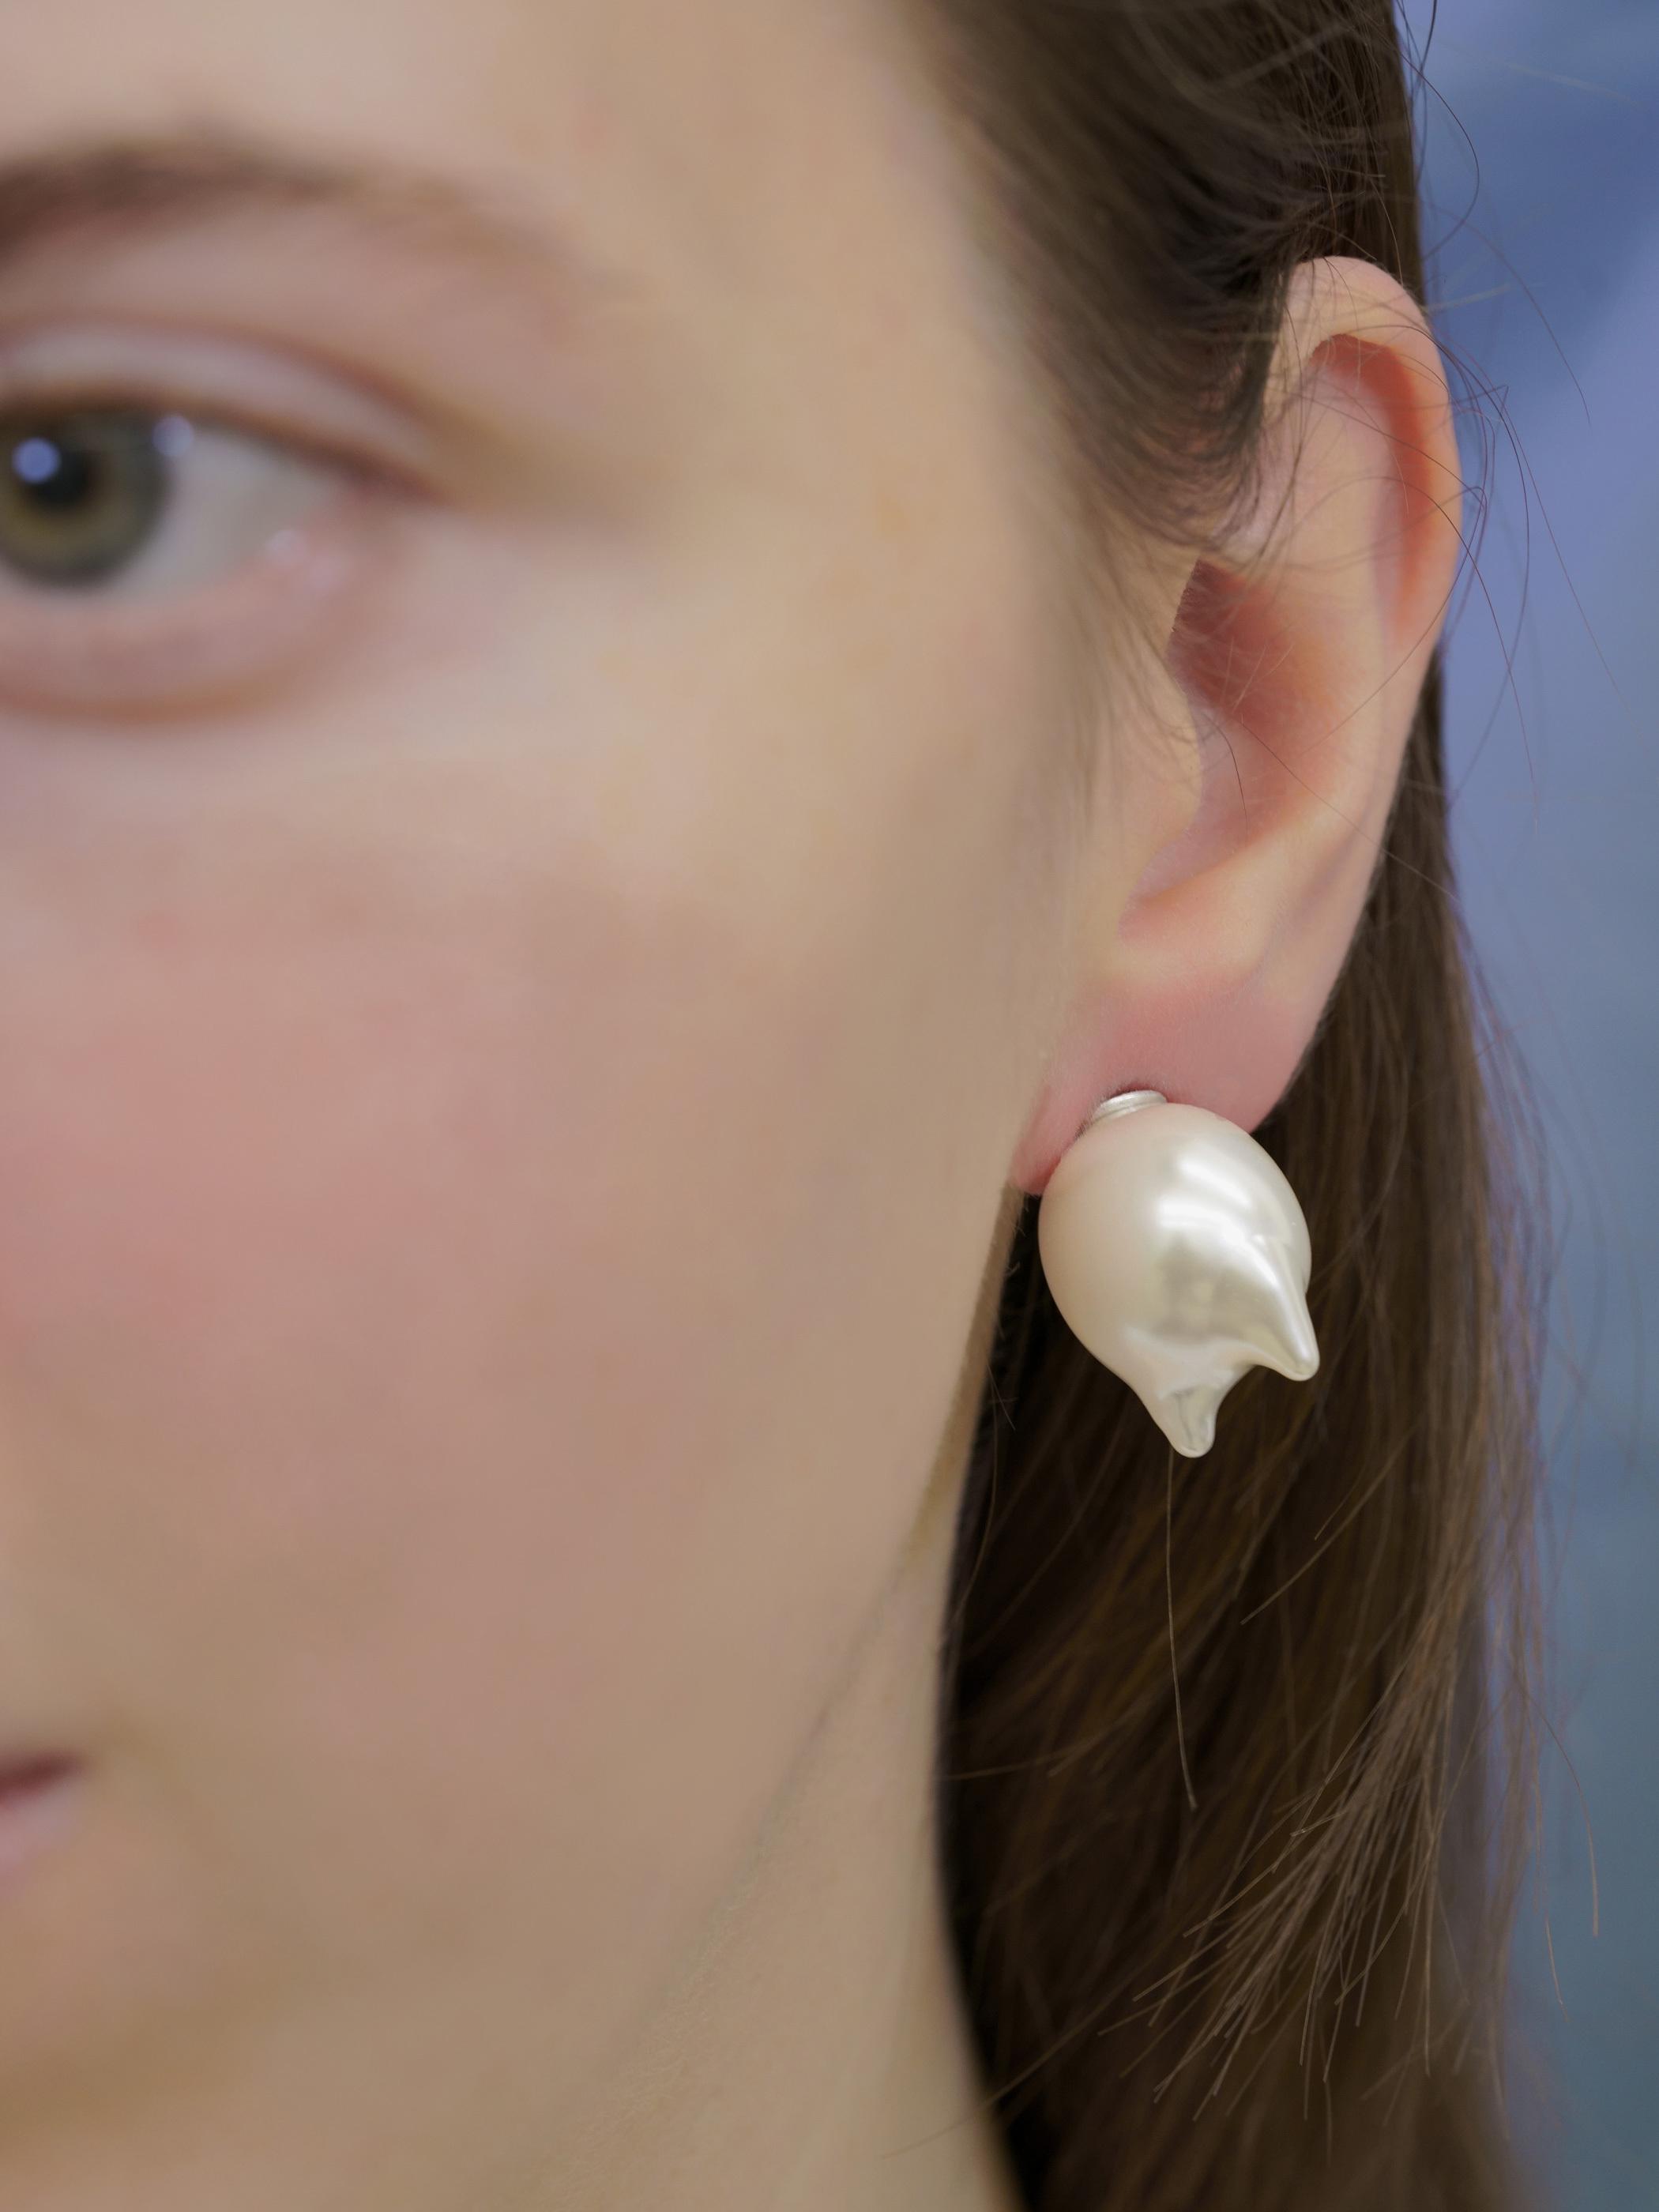 Tears of the Manmade Earrings no.3